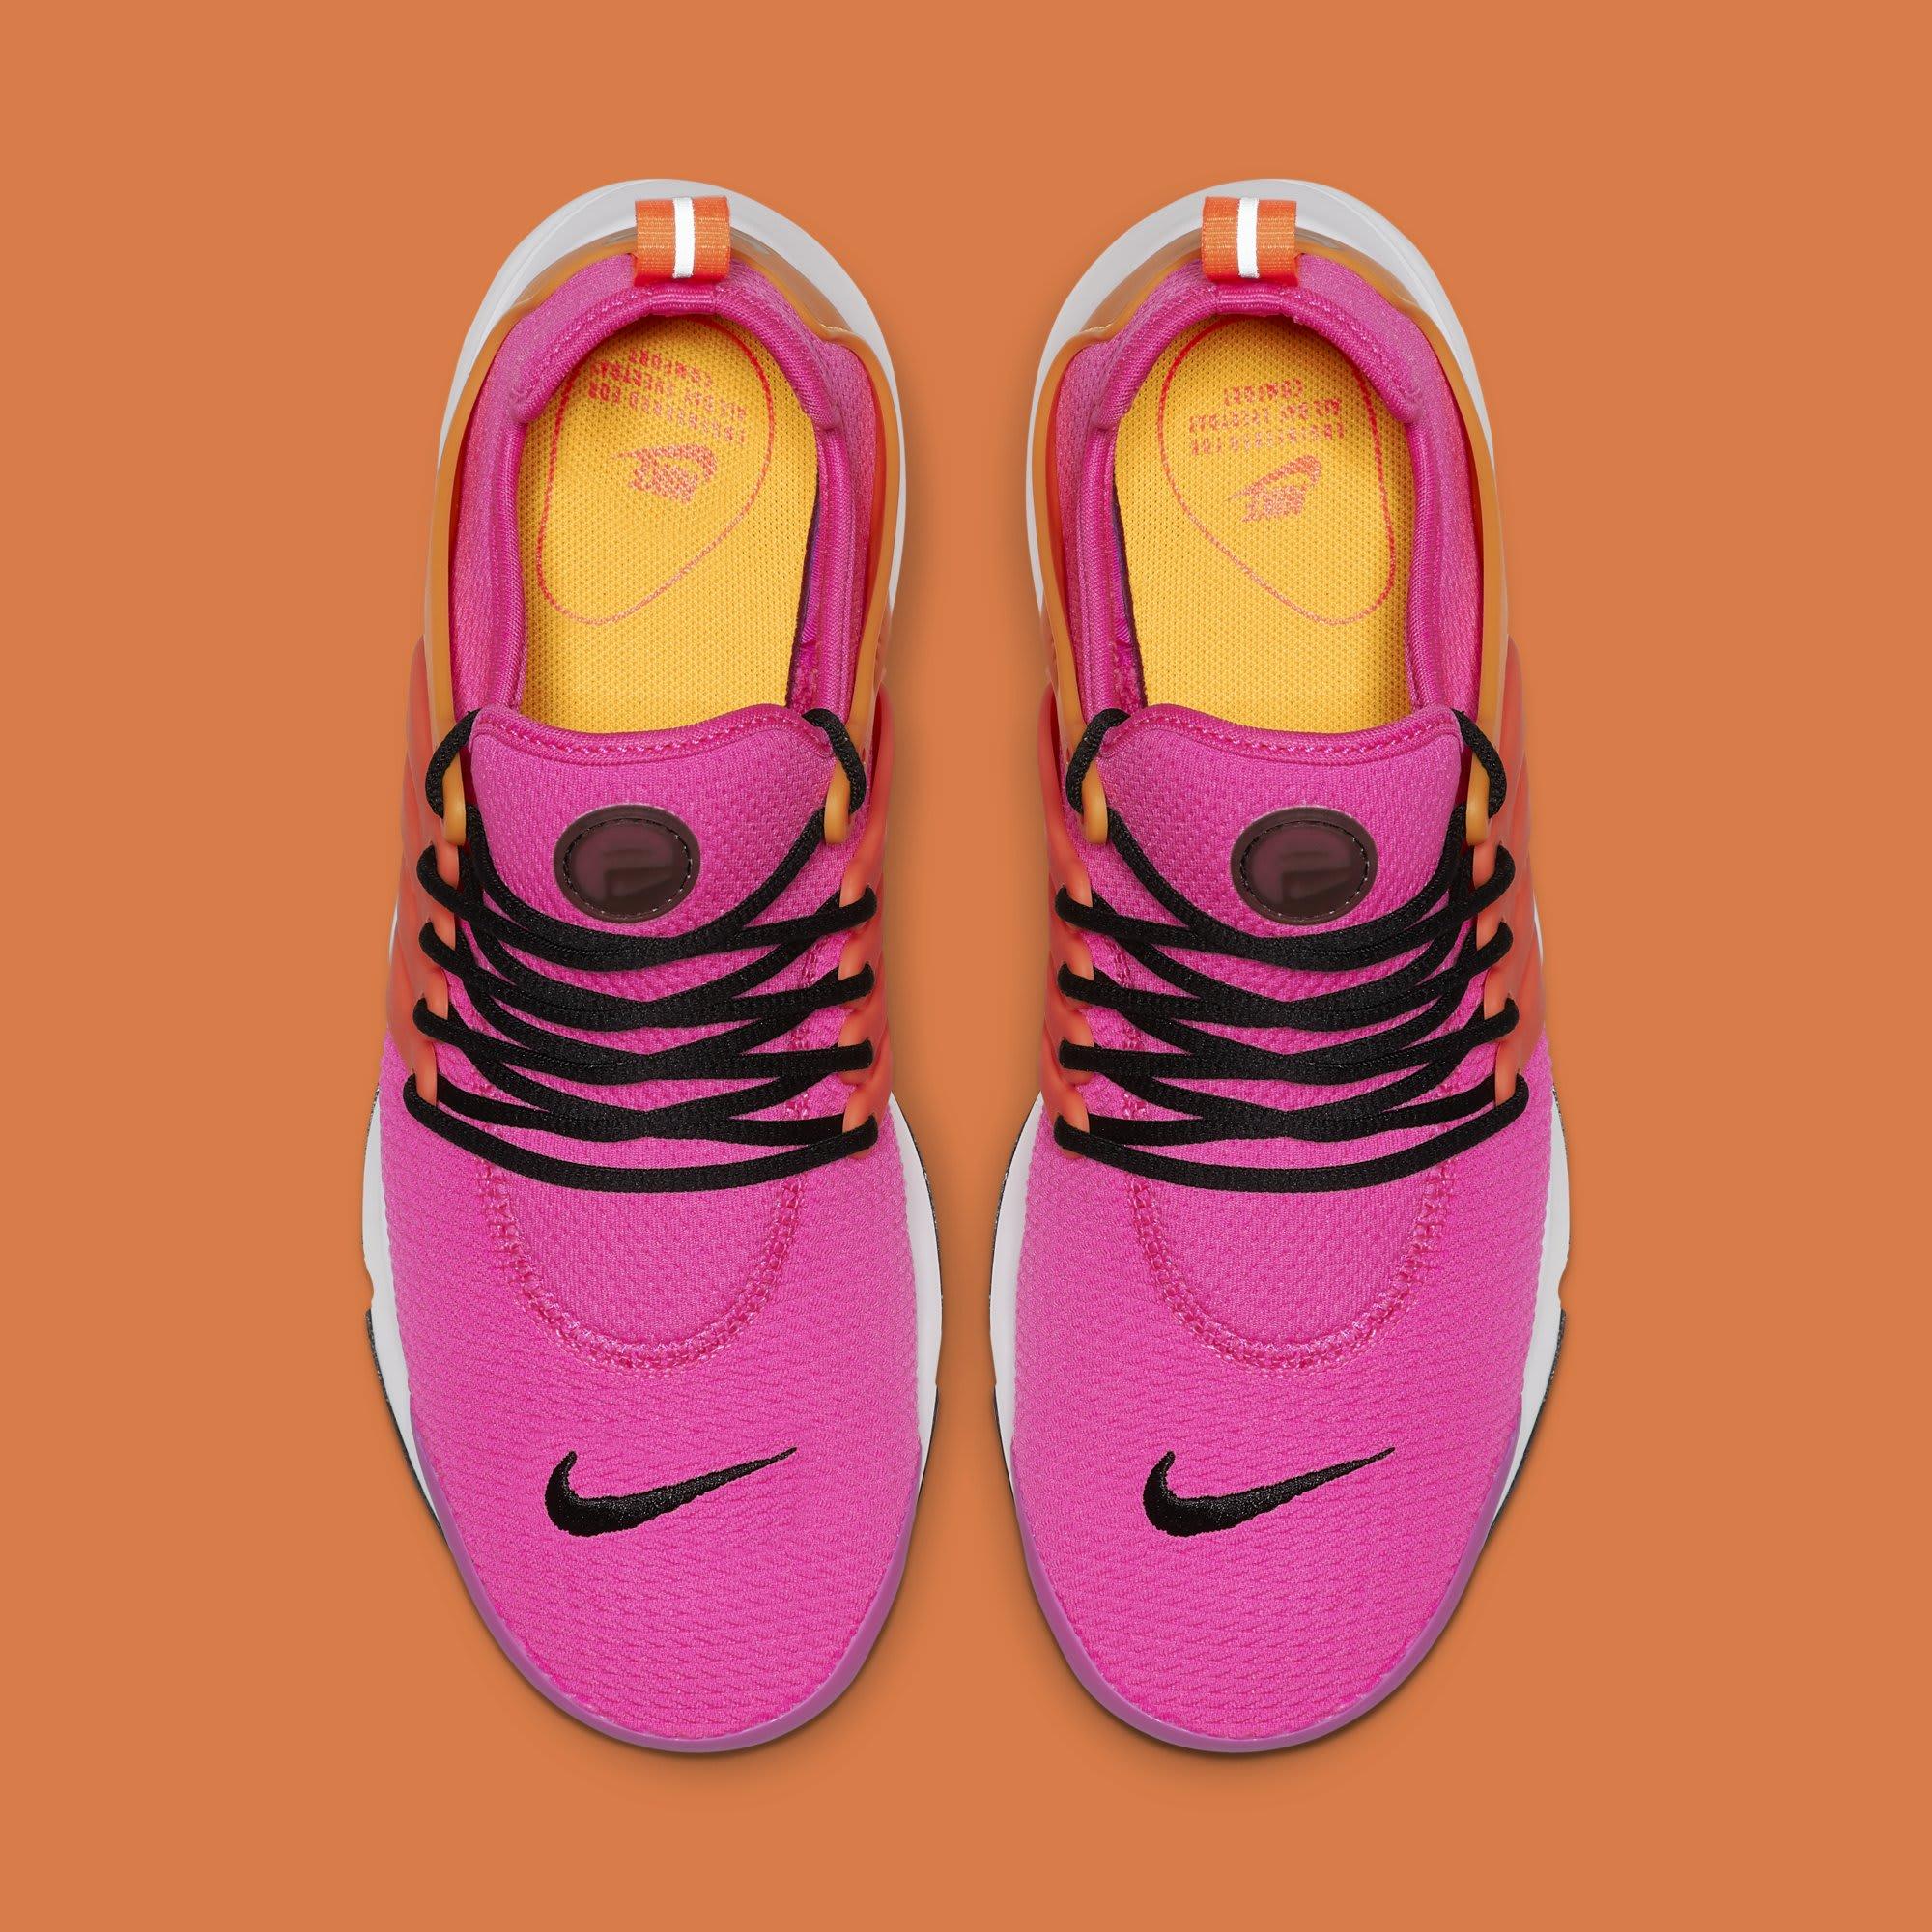 WMNS Nike Air Presto 'Laser Fuchsia' 878068-607 (Top)